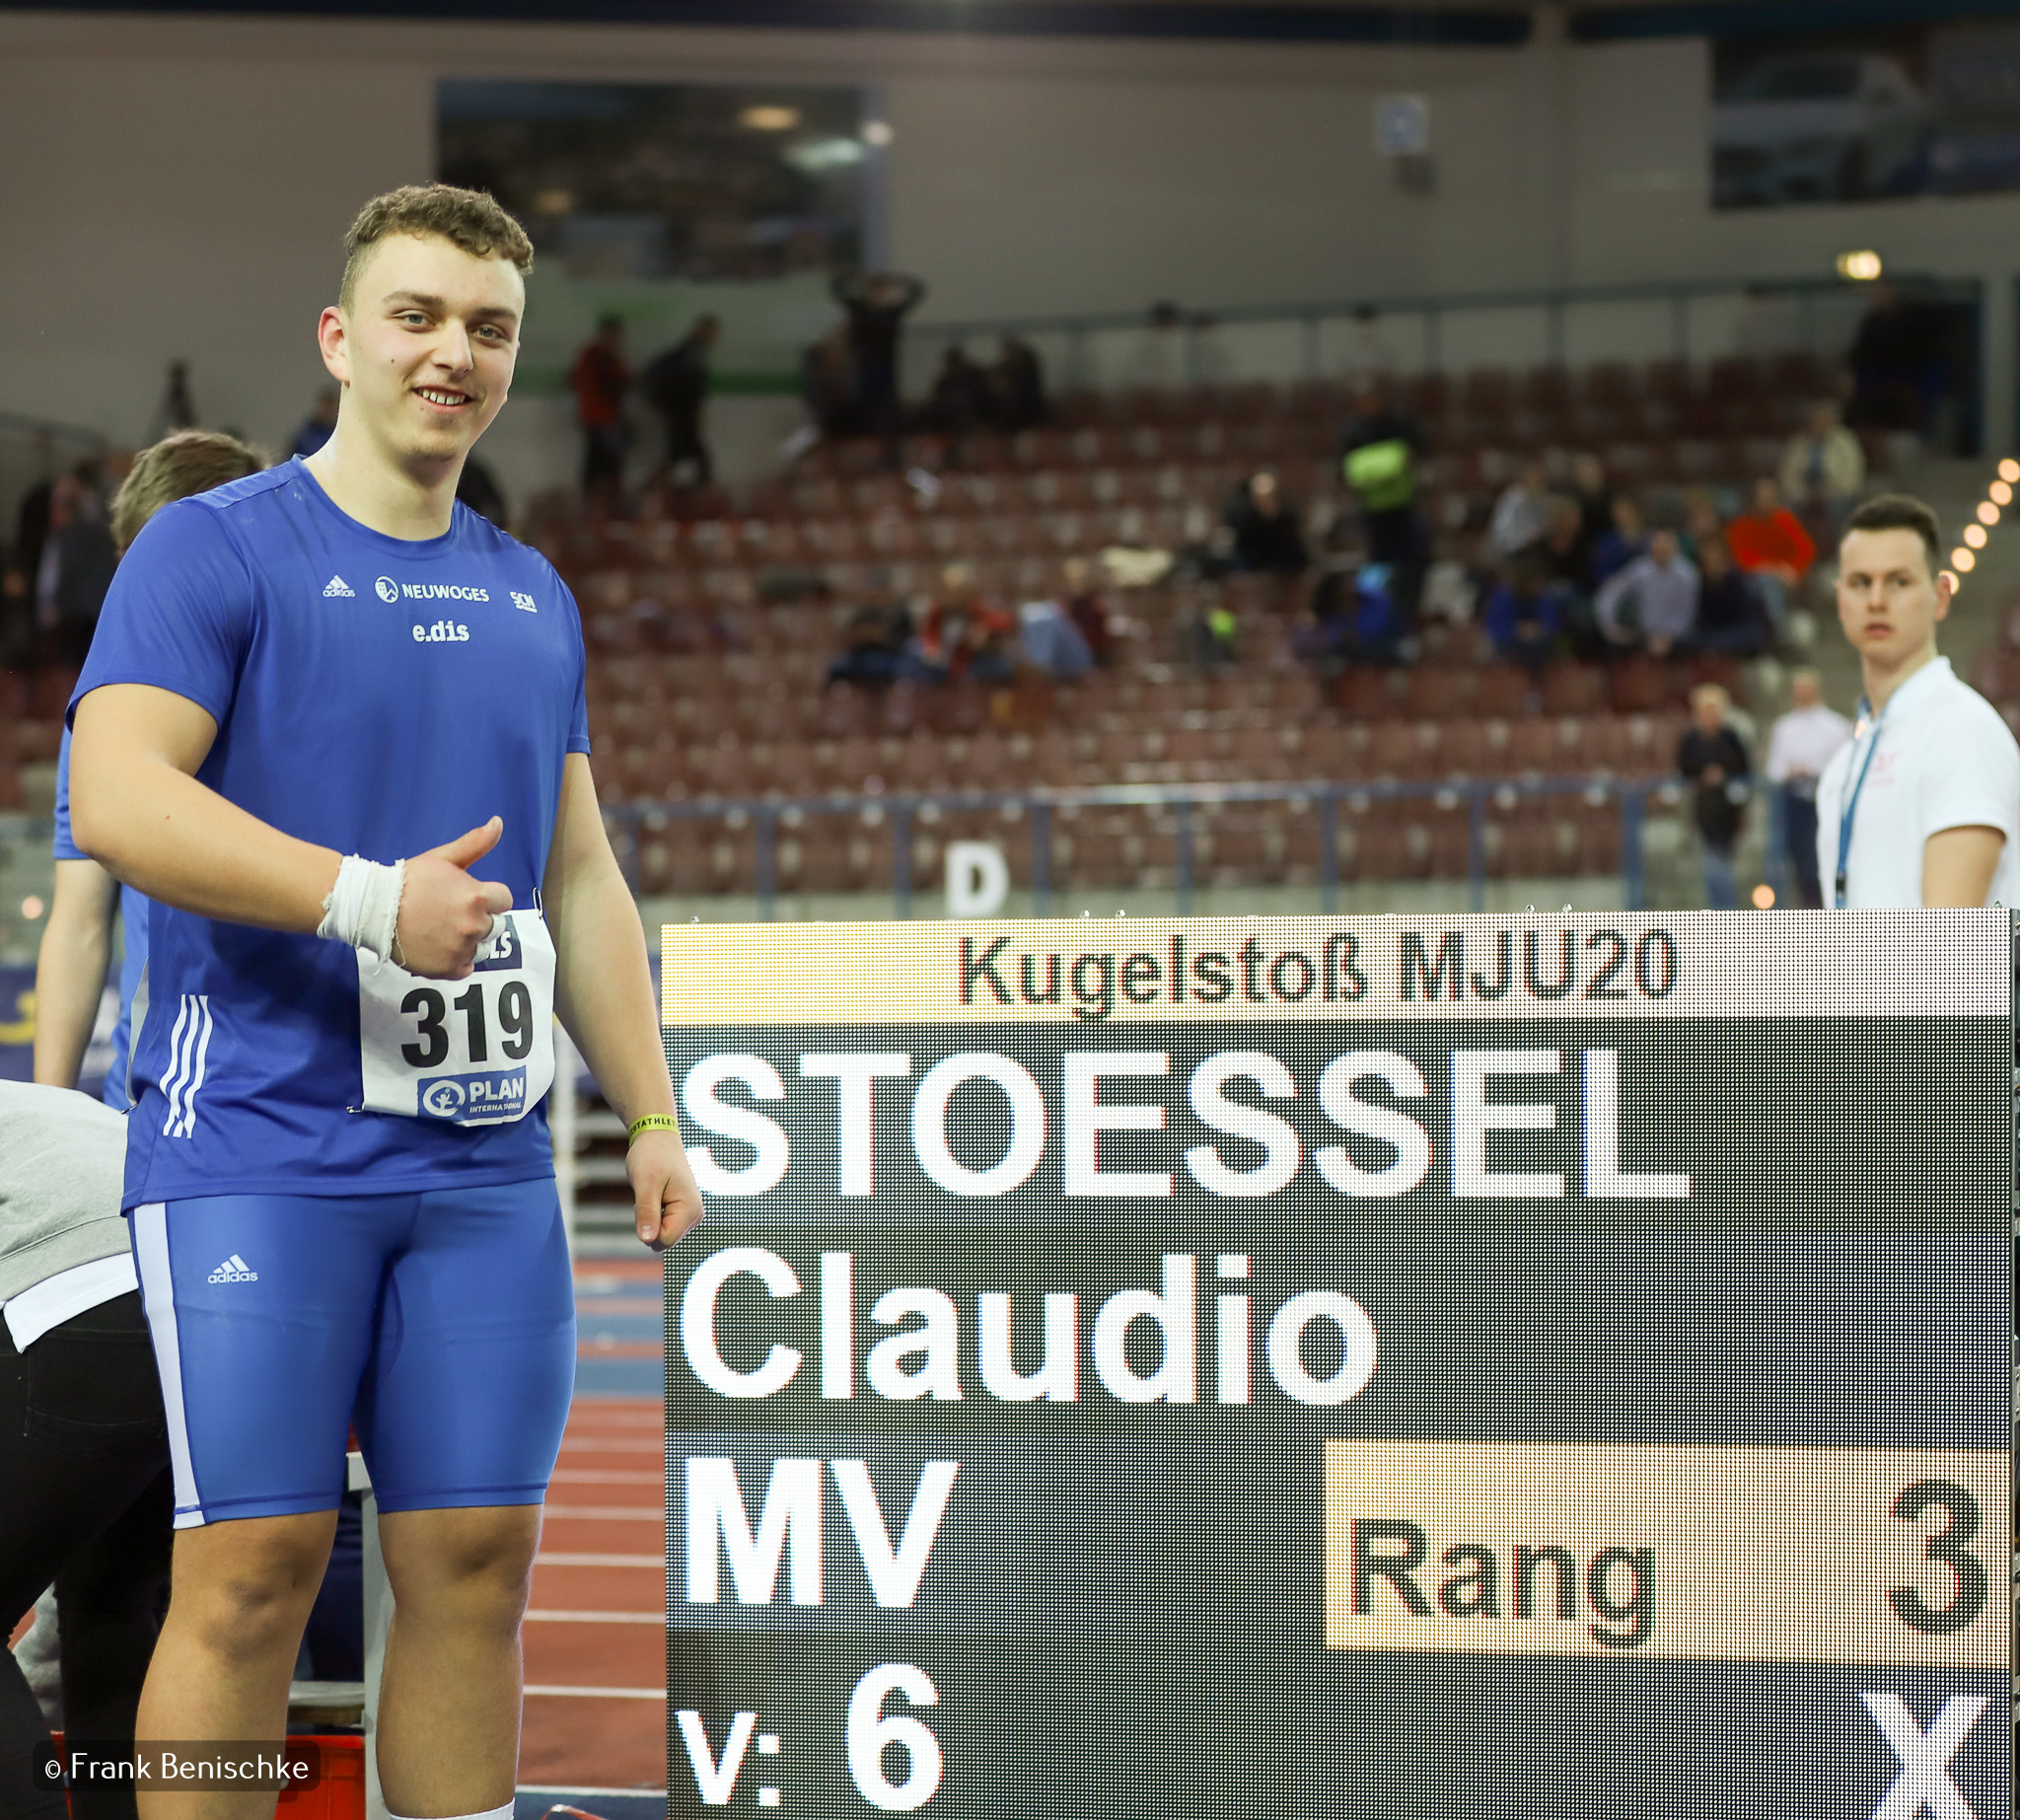 Claudio Stoessel